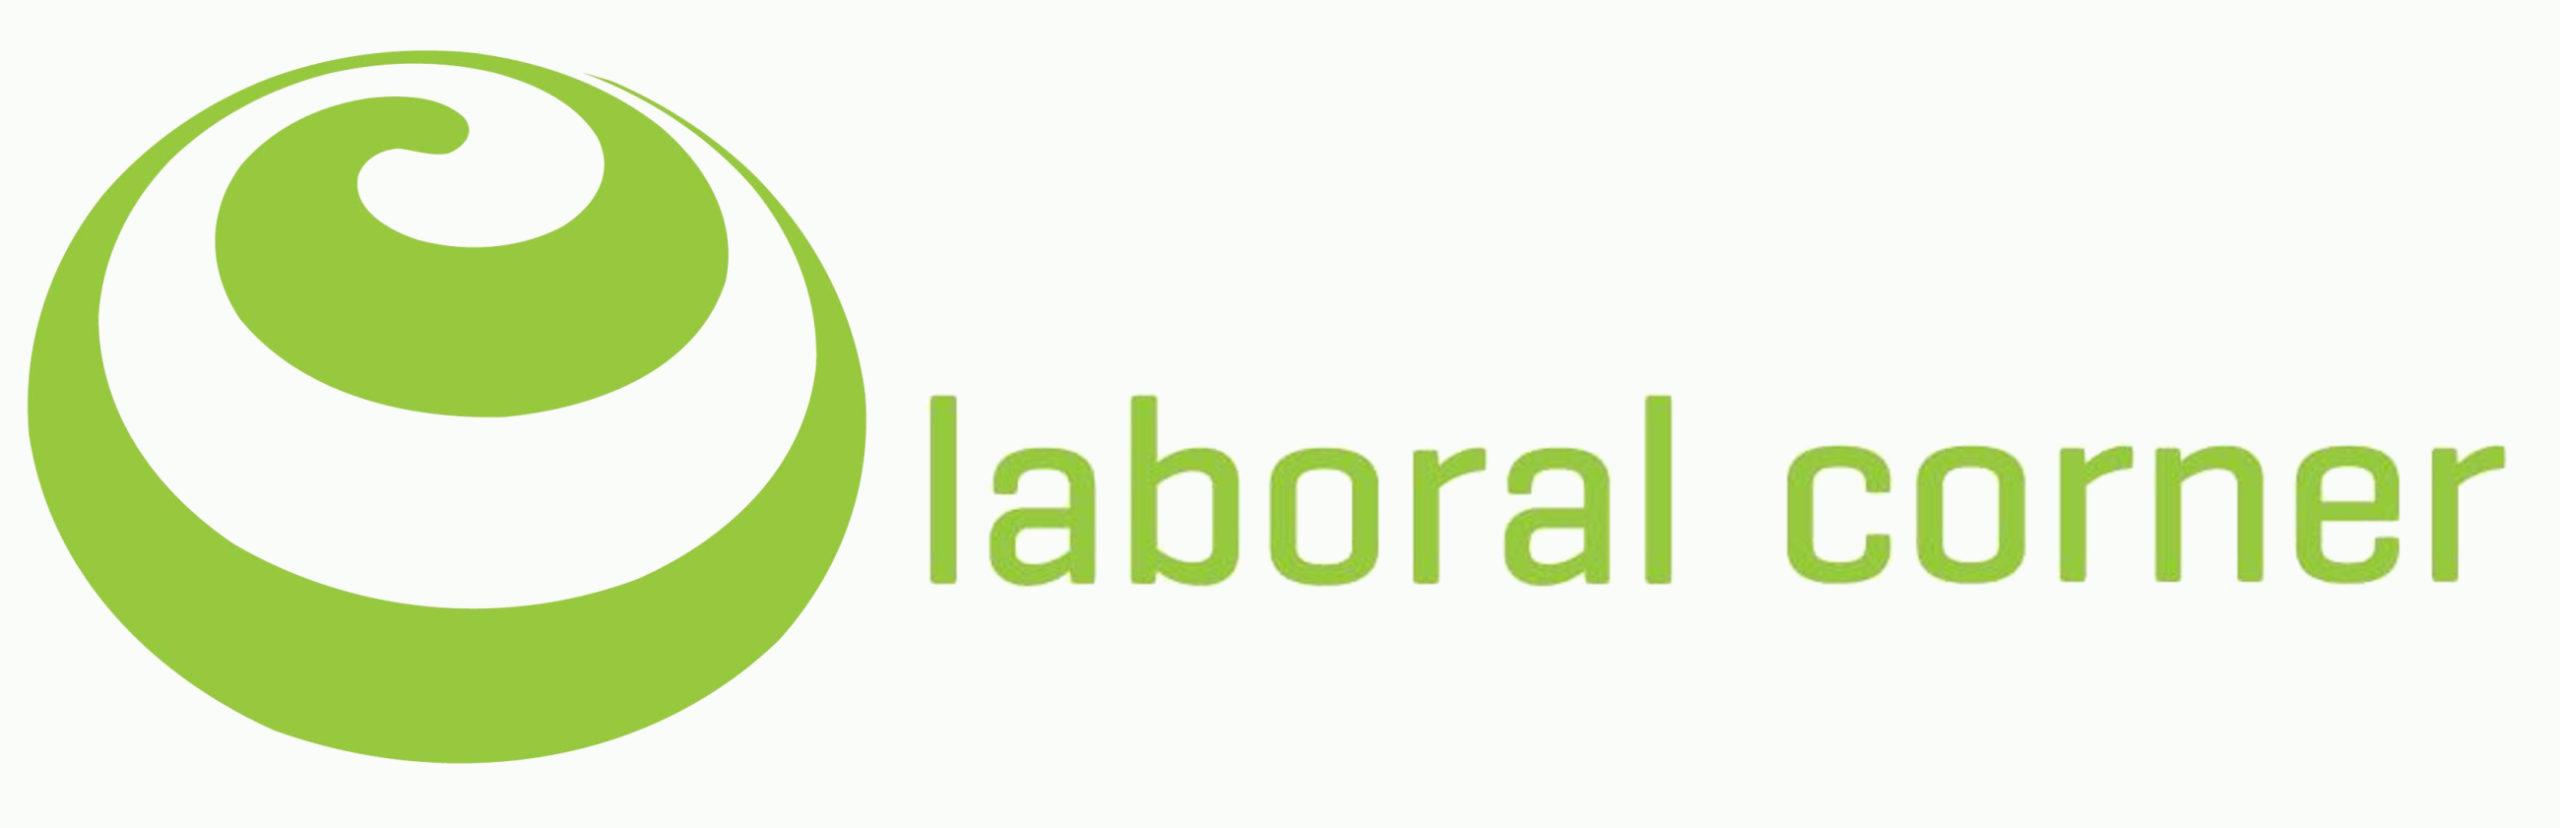 laboral corner